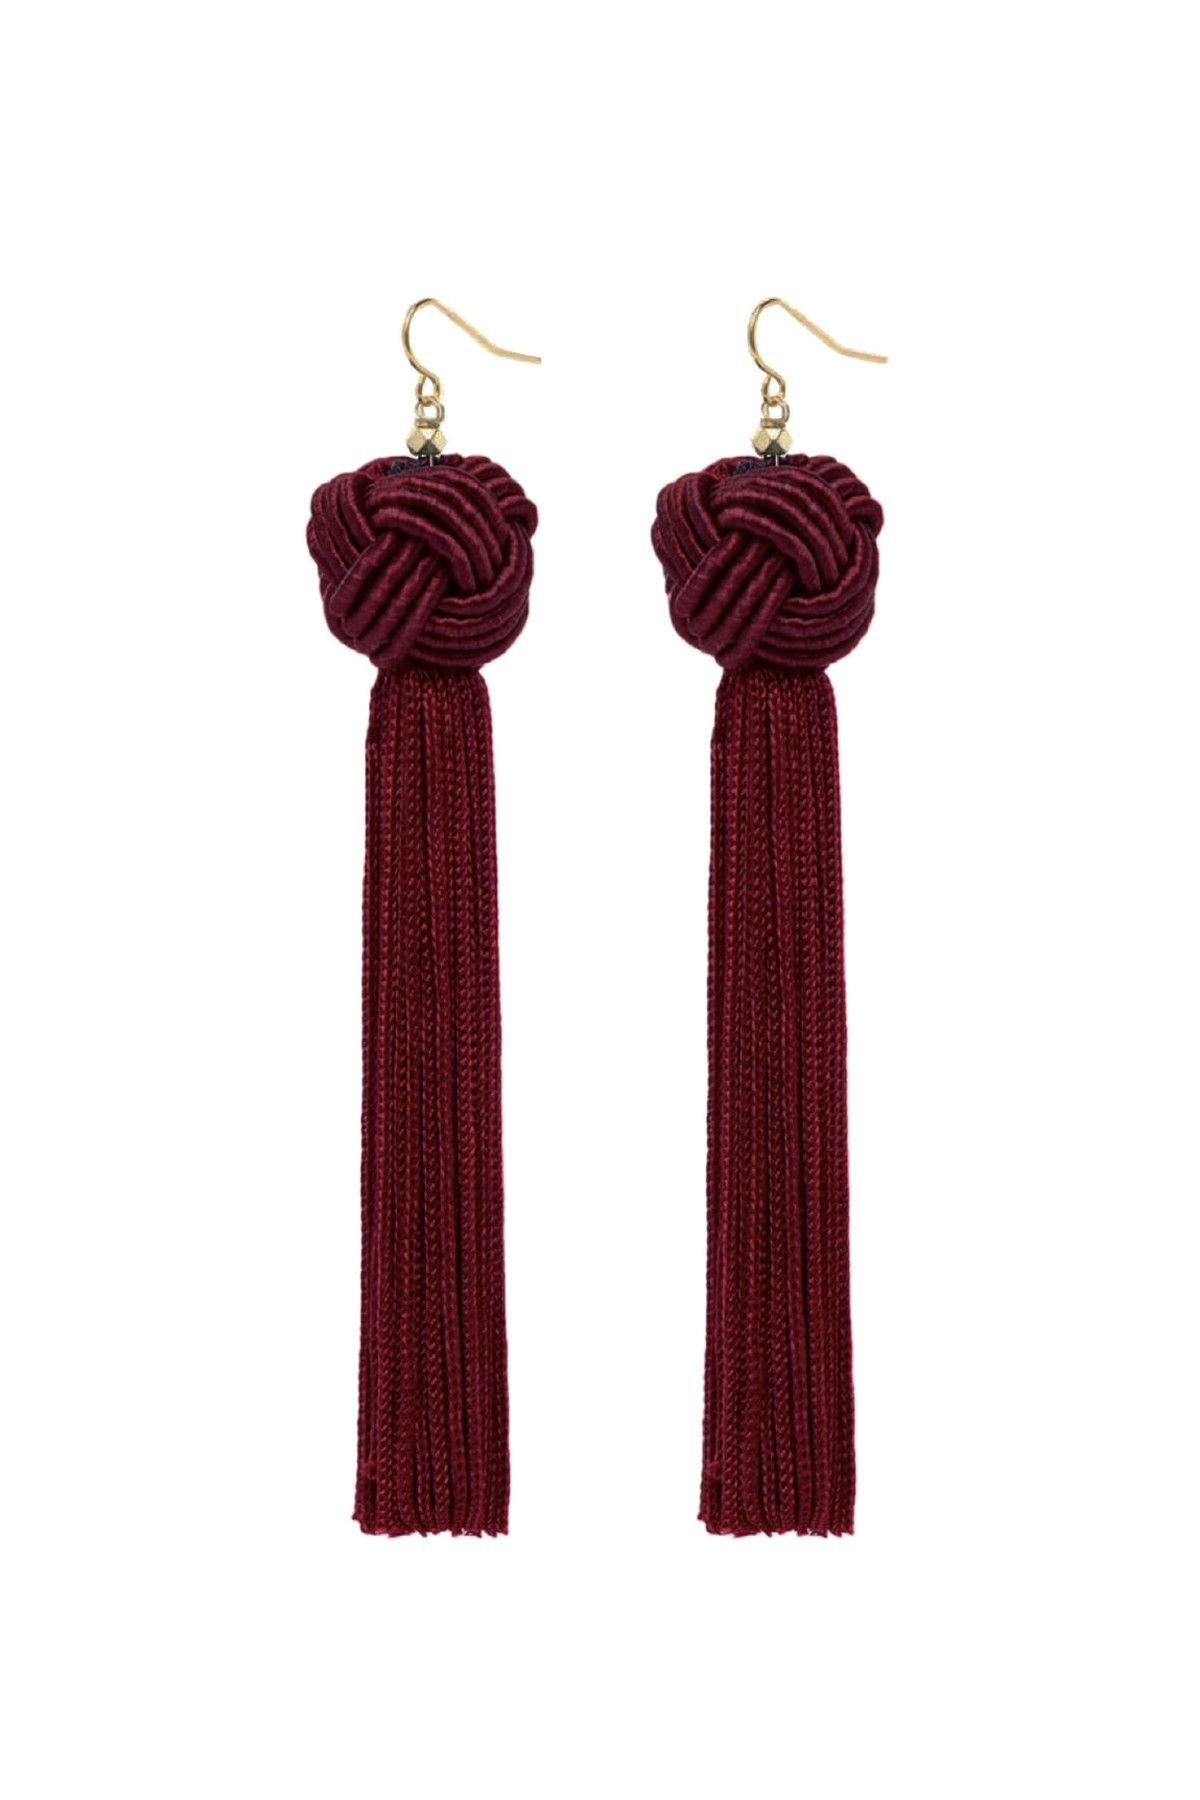 Astrid Knotted Tassel Earrings in Burgundy by Vanessa Mooney